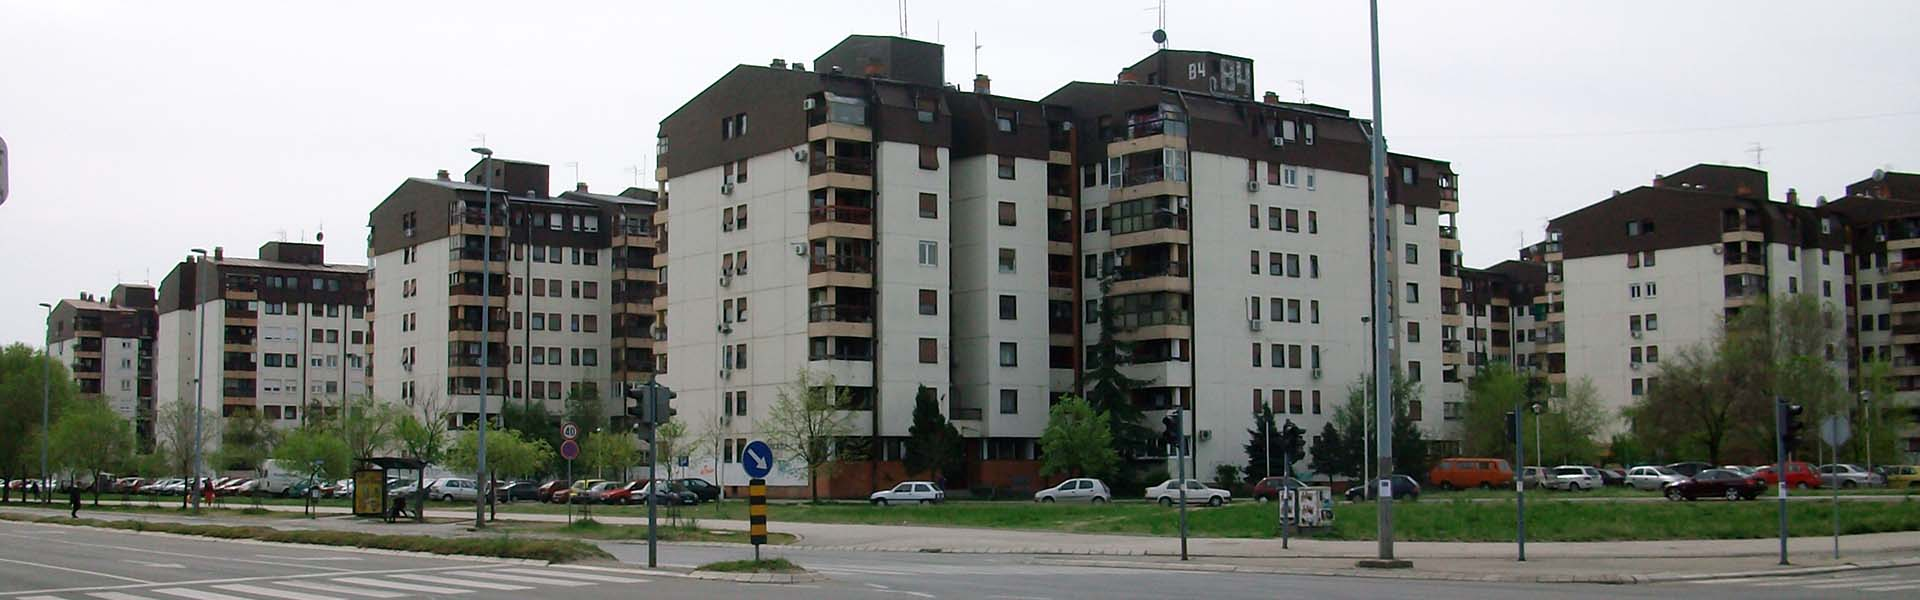 Dostava hrane Dr. Ivana Ribara | Beograd